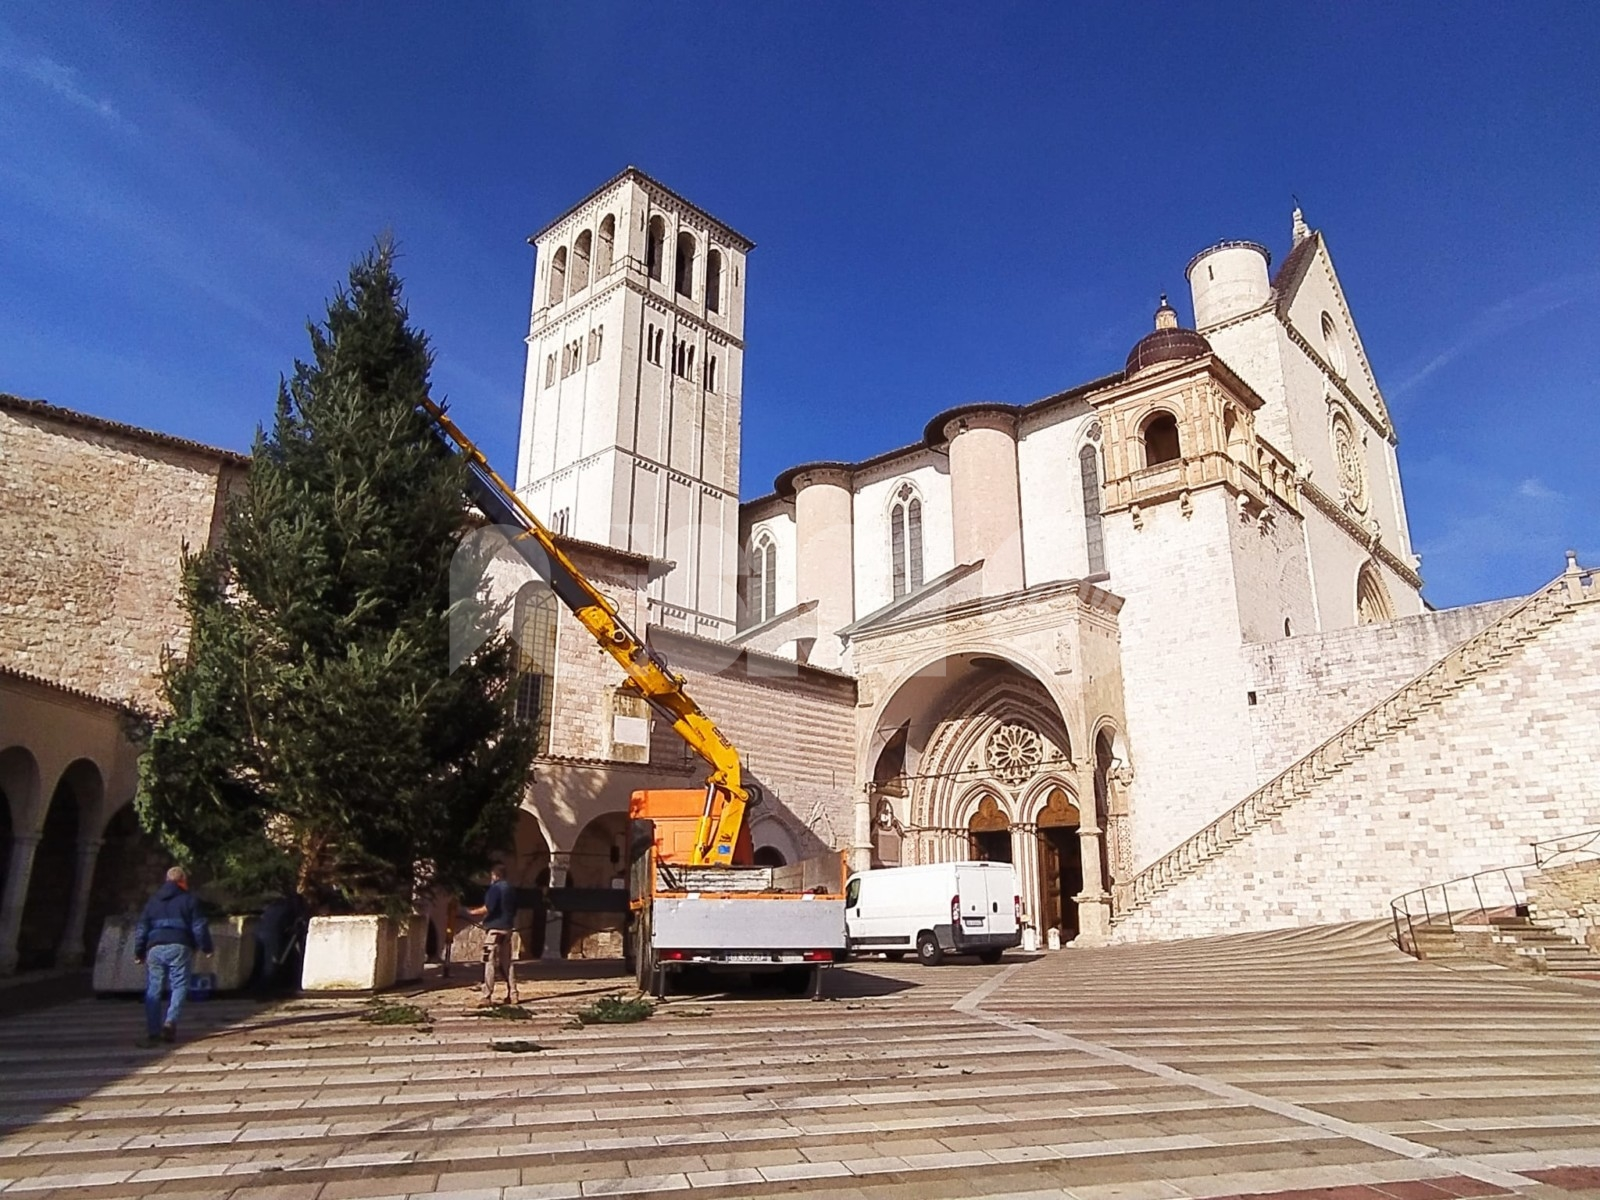 Il Natale di Francesco 2020: Assisi presepe tra spiritualità, tradizione e multimedia